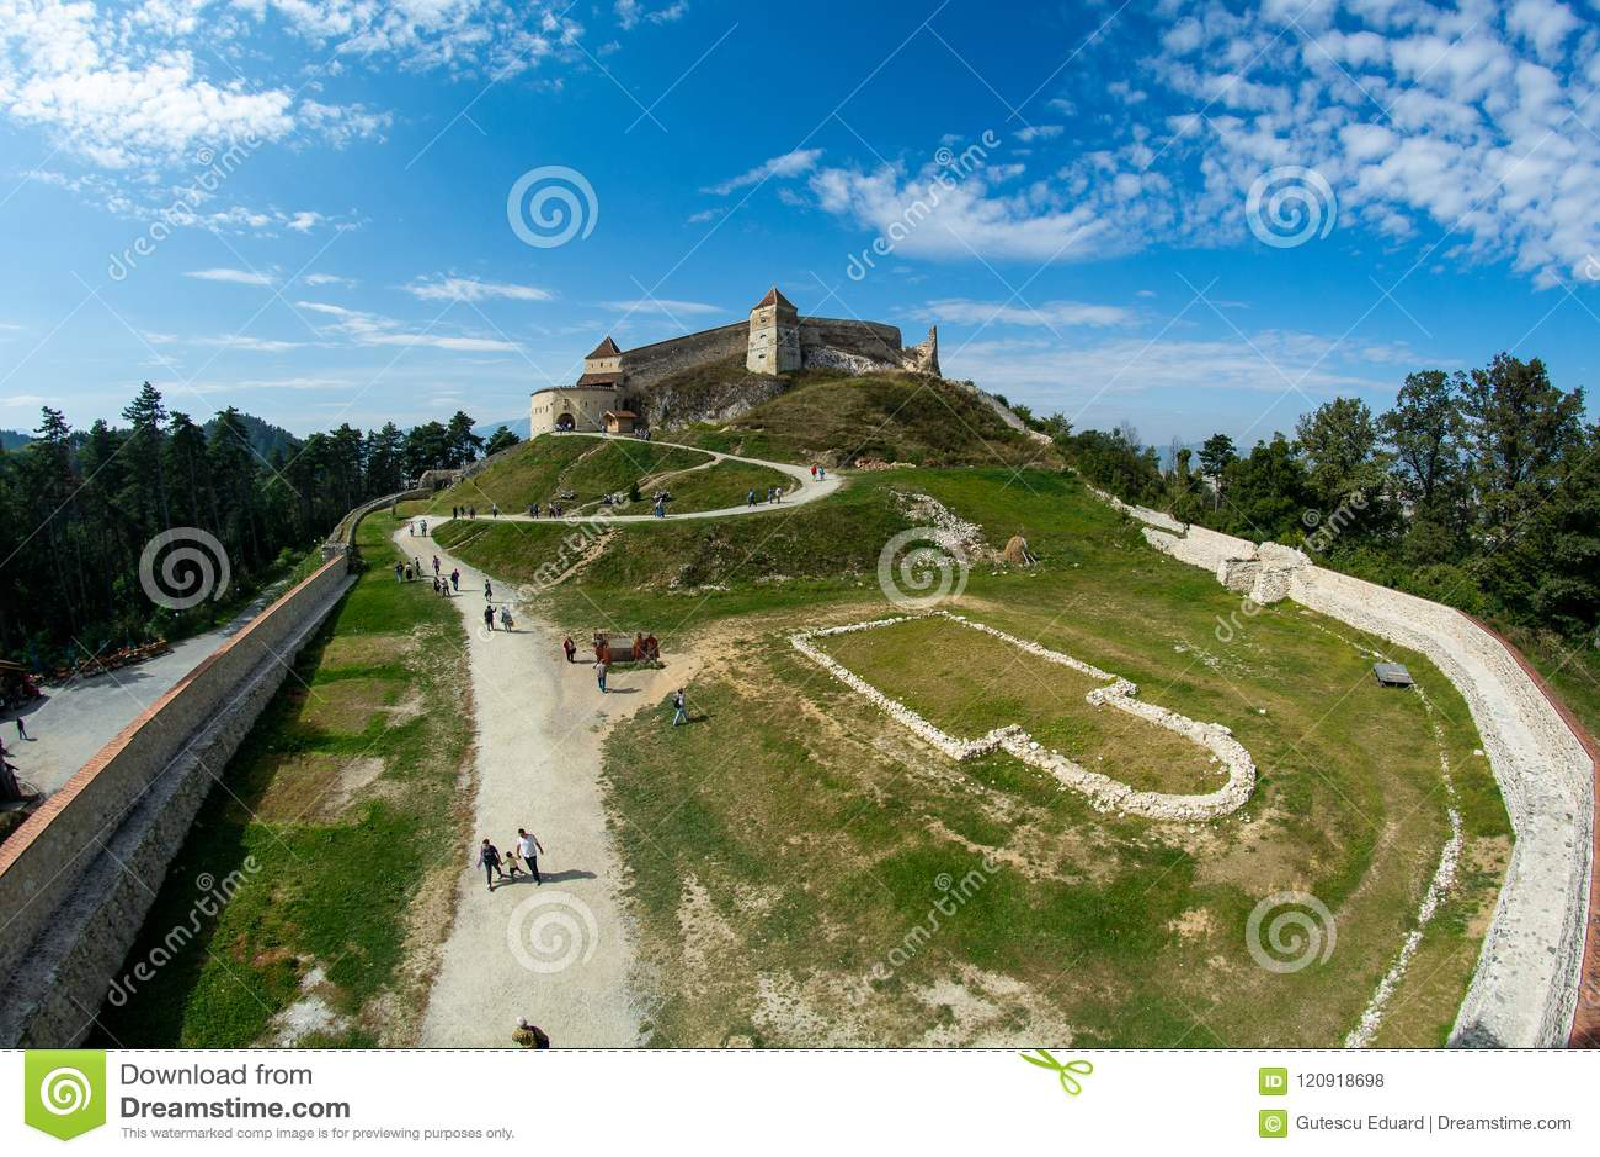 Rasnov Citadel from Brasov , Romania inside court view